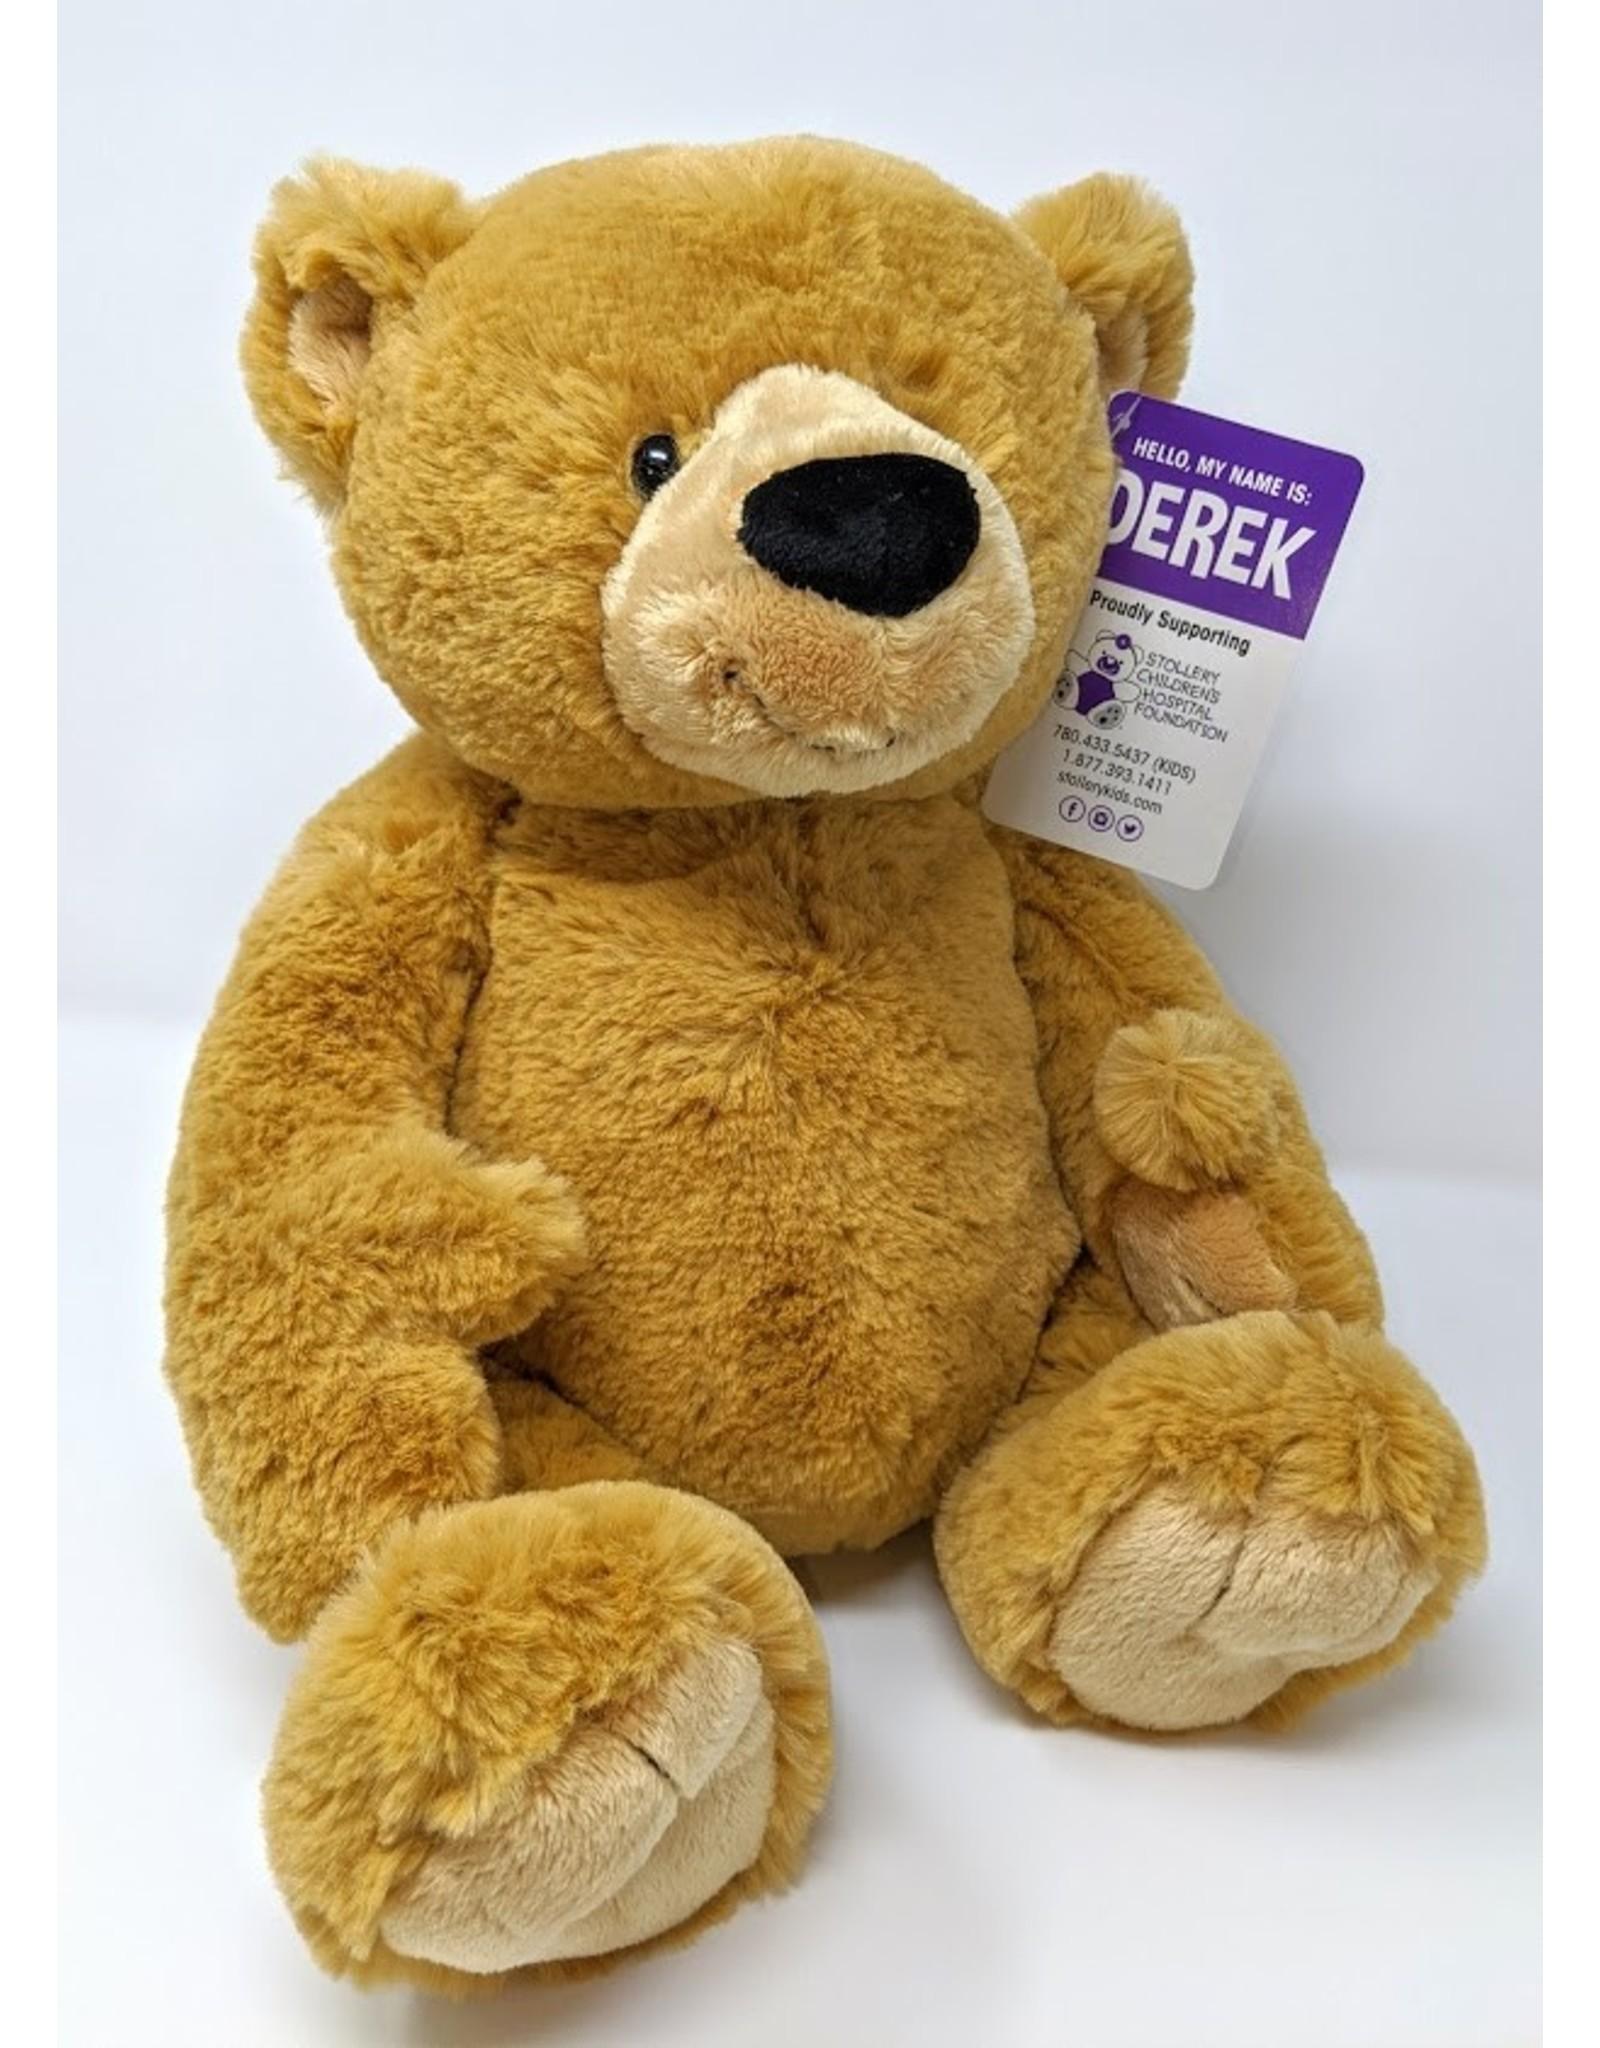 GUND Charity Bear Derek - large